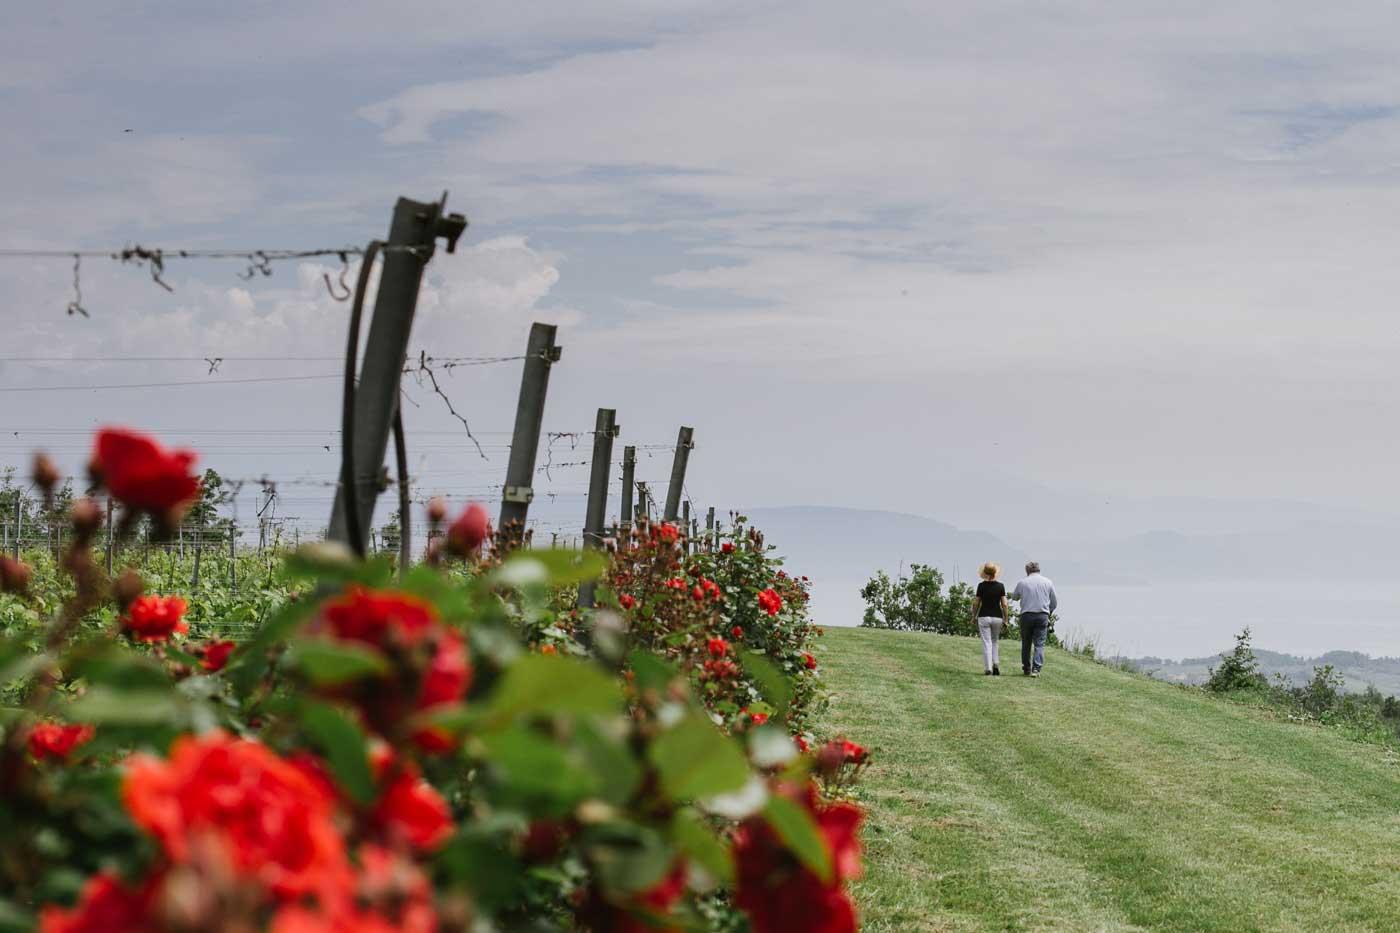 wine tour - Valtenesi - Lake Garda